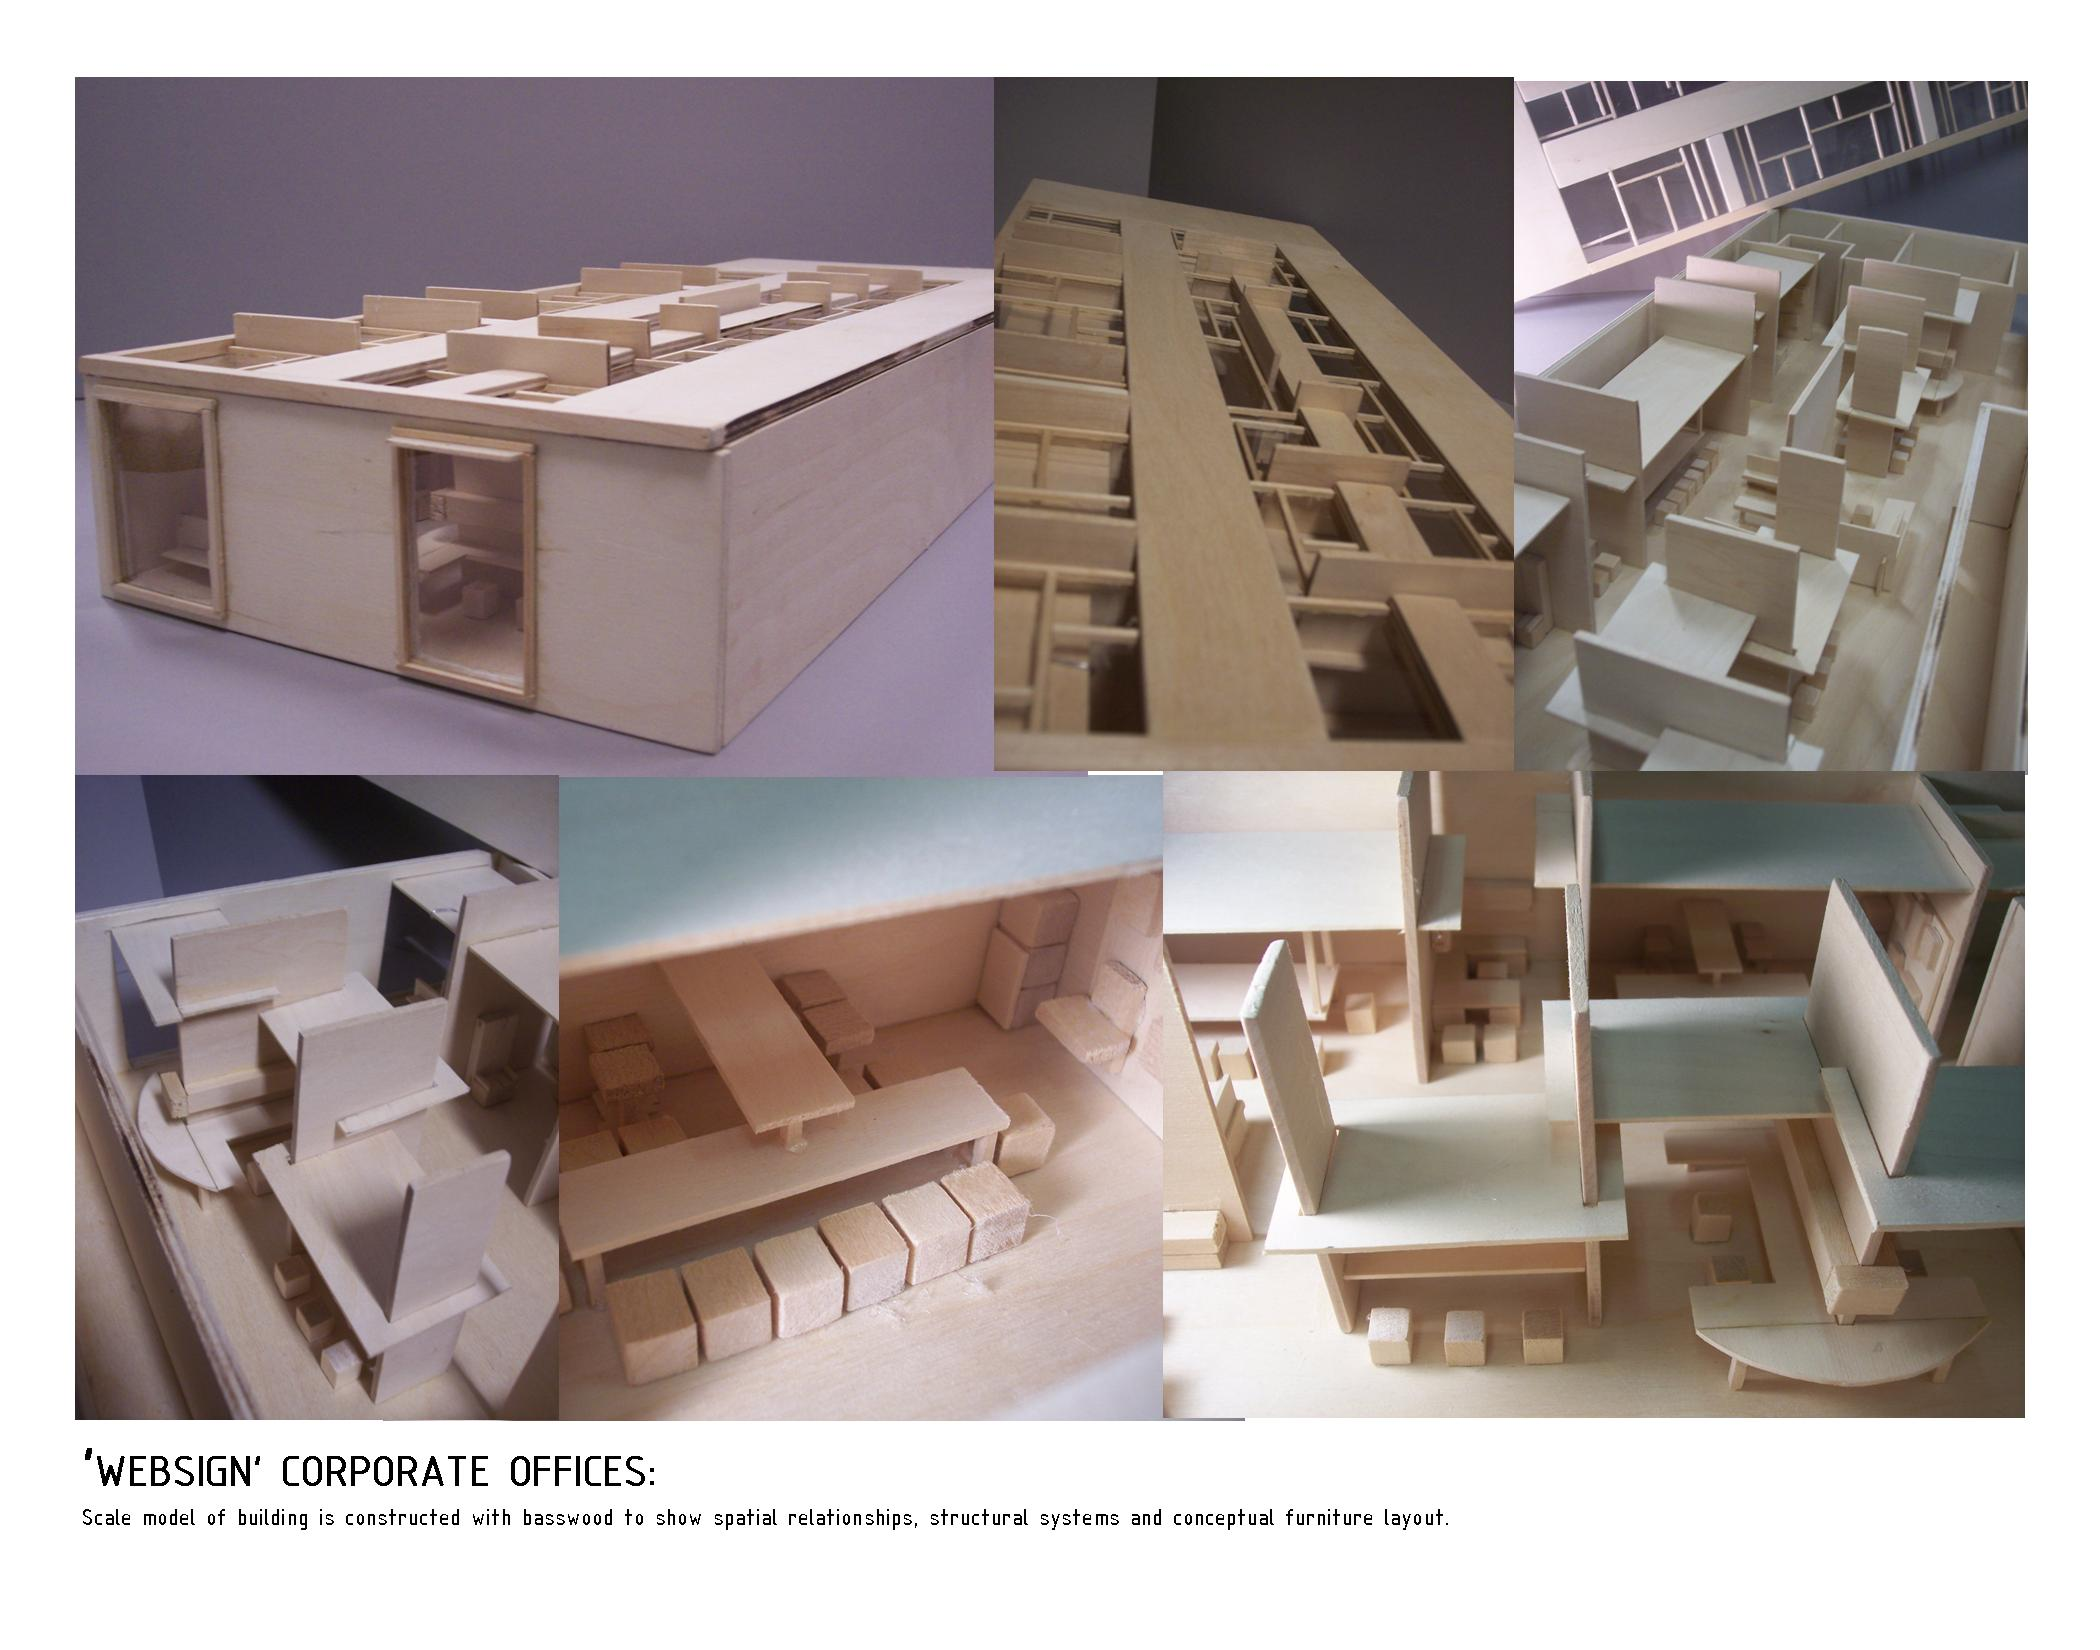 Philadelphia University Interior Design Portfolio By Christina Corsaro At